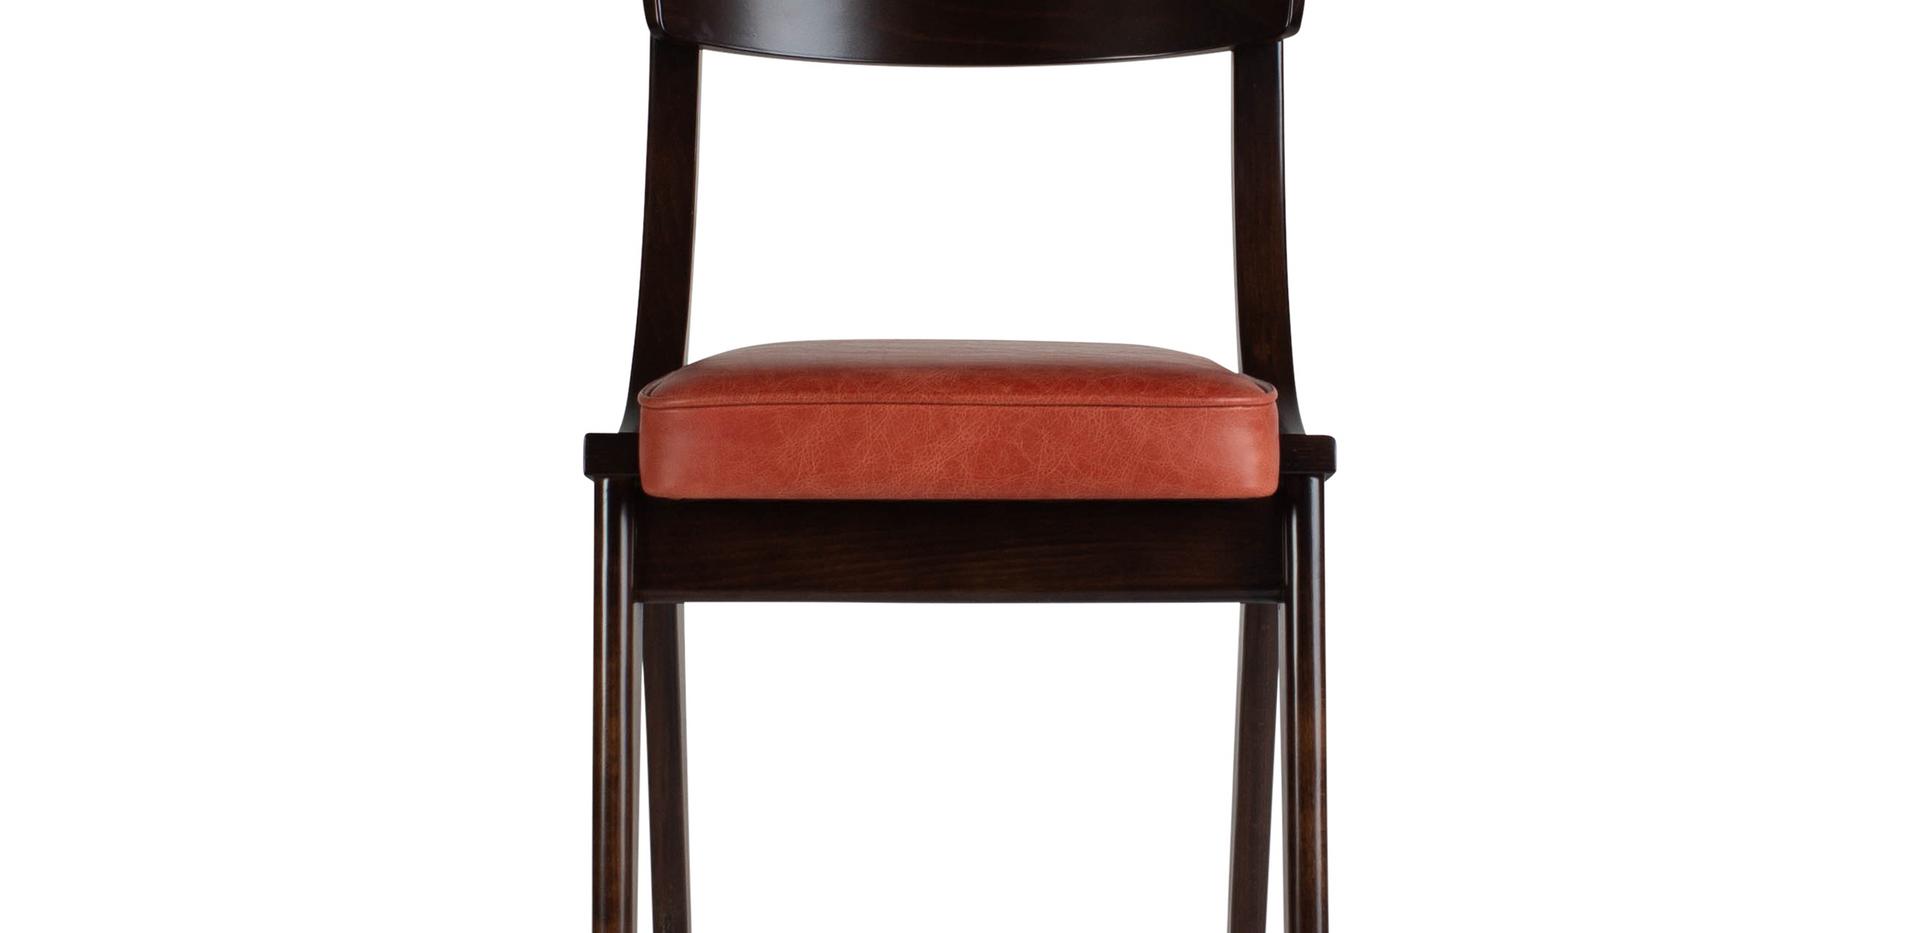 Verwood Orange Chair Front